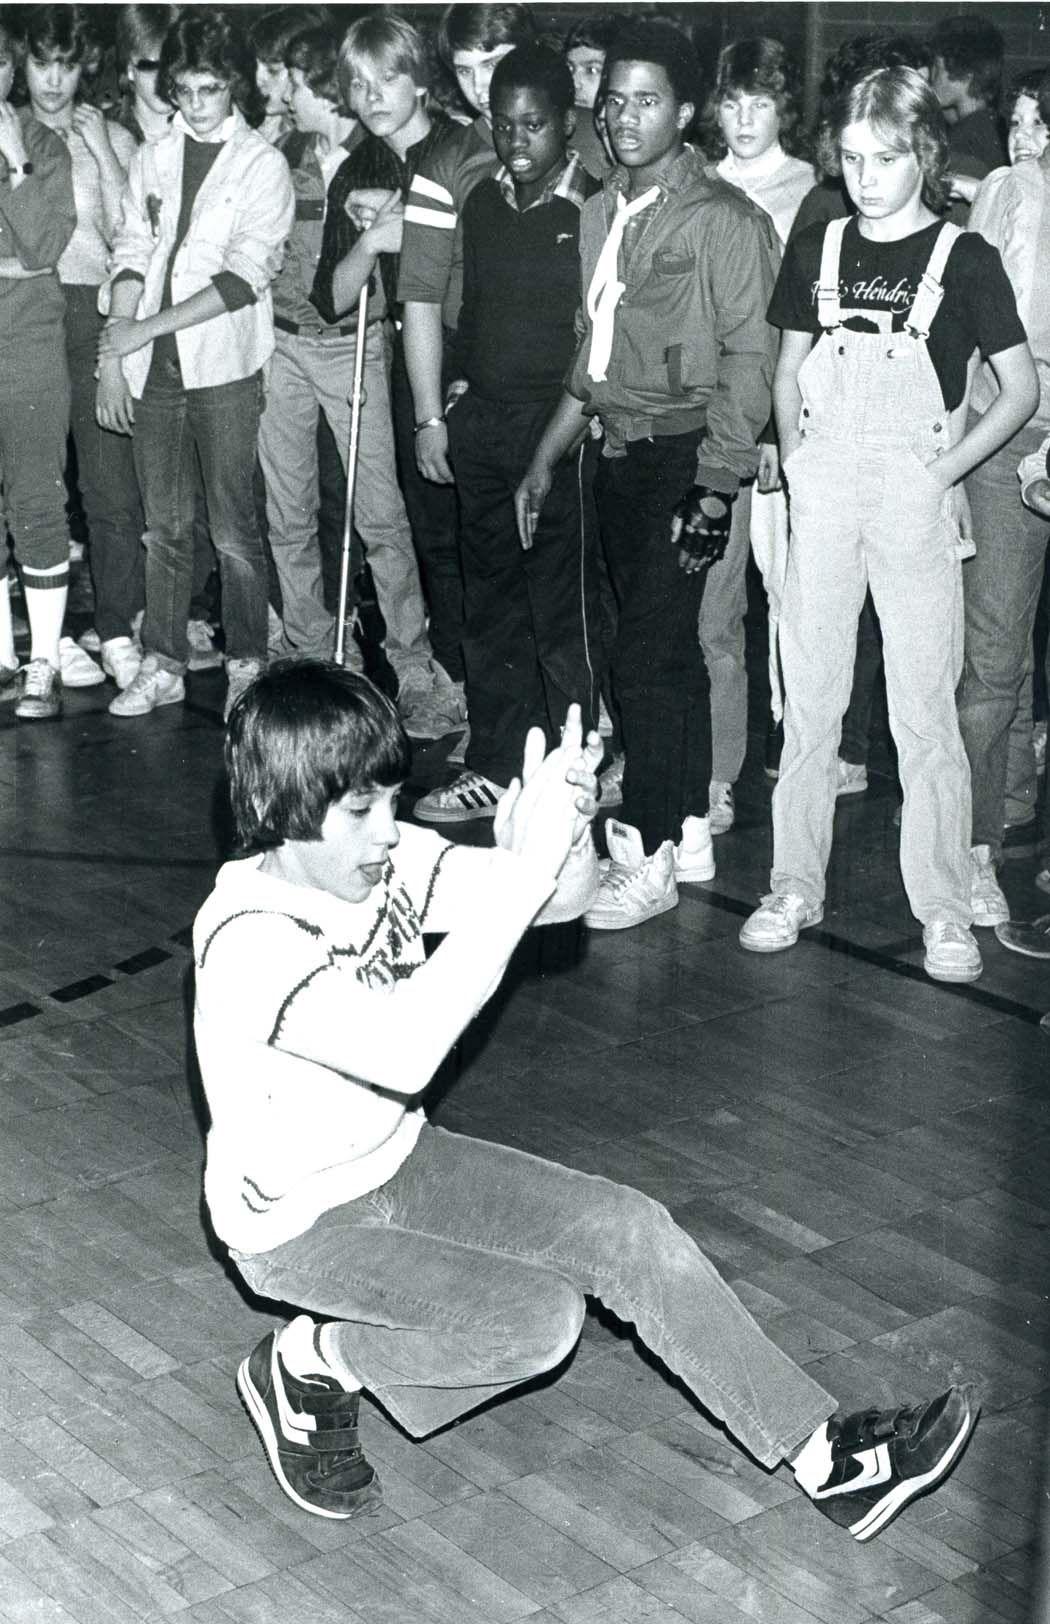 Break Dancing Kid In The 80 S I Like The Look Of White Boy Can Dance In The Background Break Dance Dance Hip Hop Culture